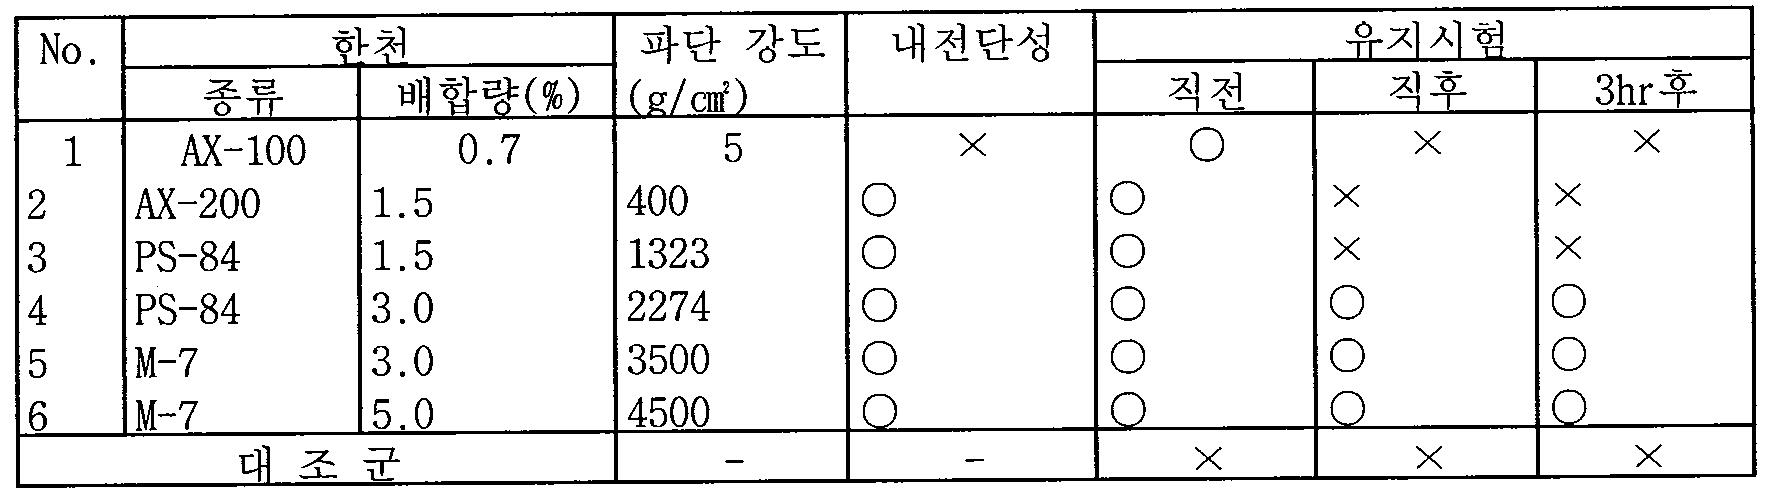 Figure 112005503159226-pat00014